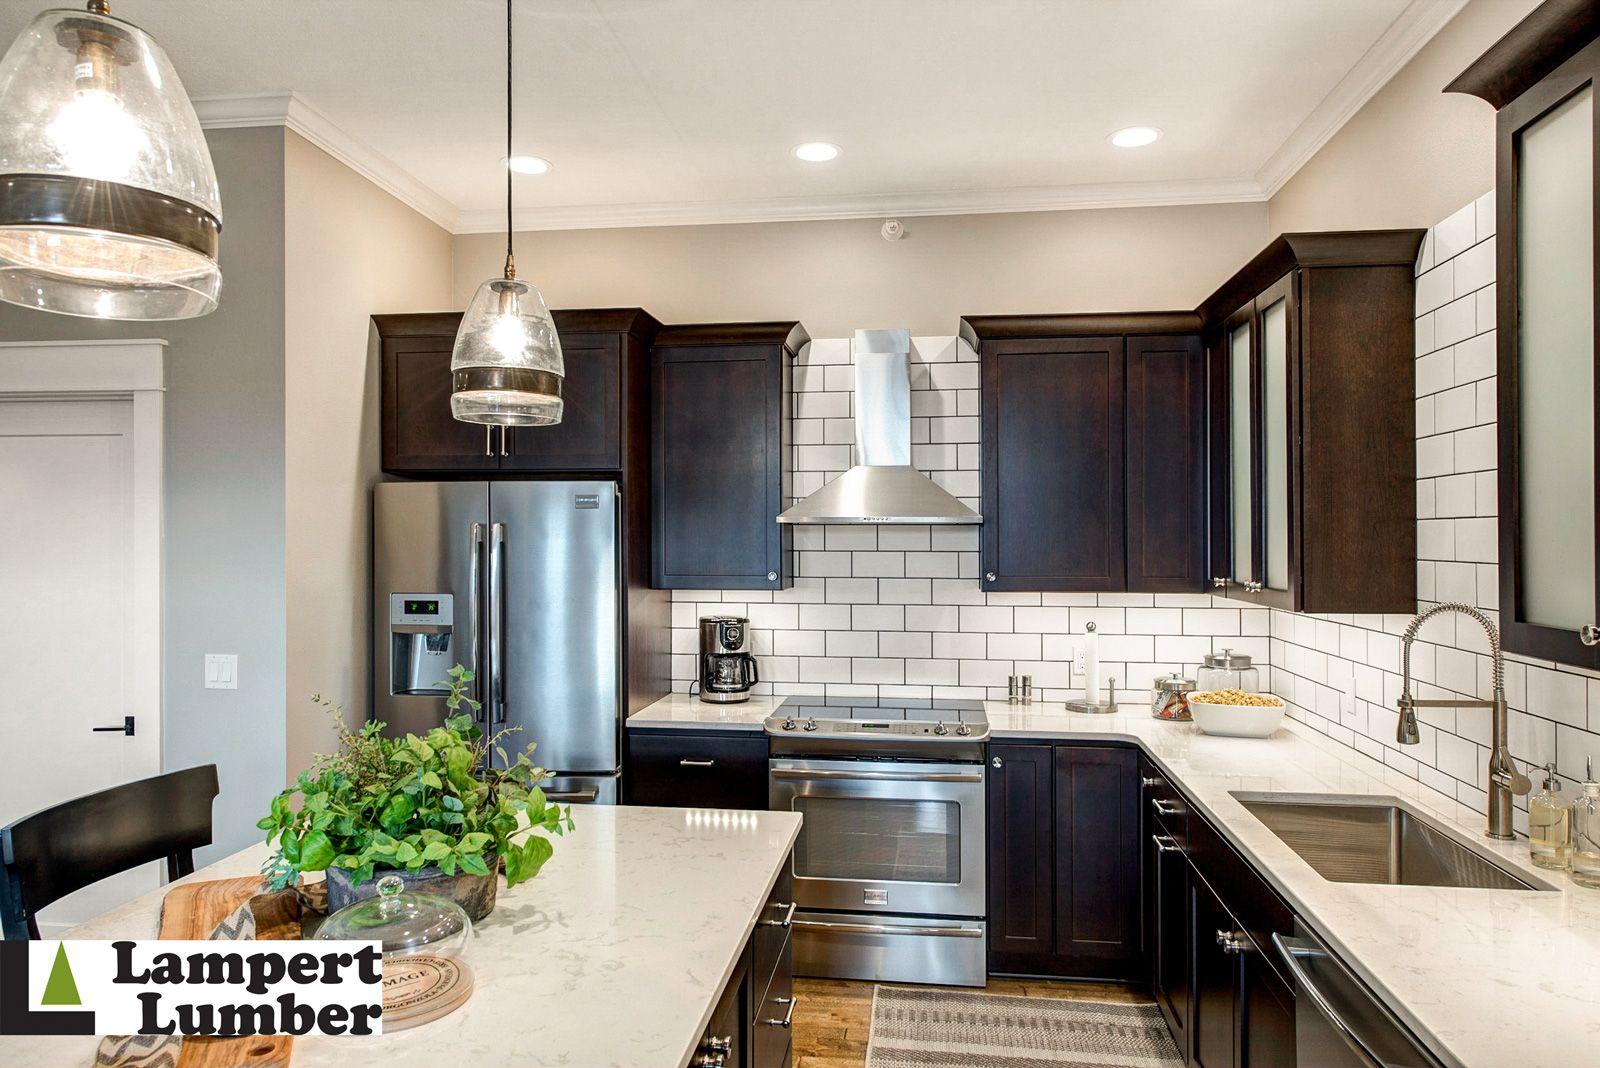 A Kitchen Master Bath And Kid S Bathroom Remodel In Pella Iowa Was Updated From Bland And Kitchen Cabinet Remodel Trendy Kitchen Backsplash Kitchen Cabinets